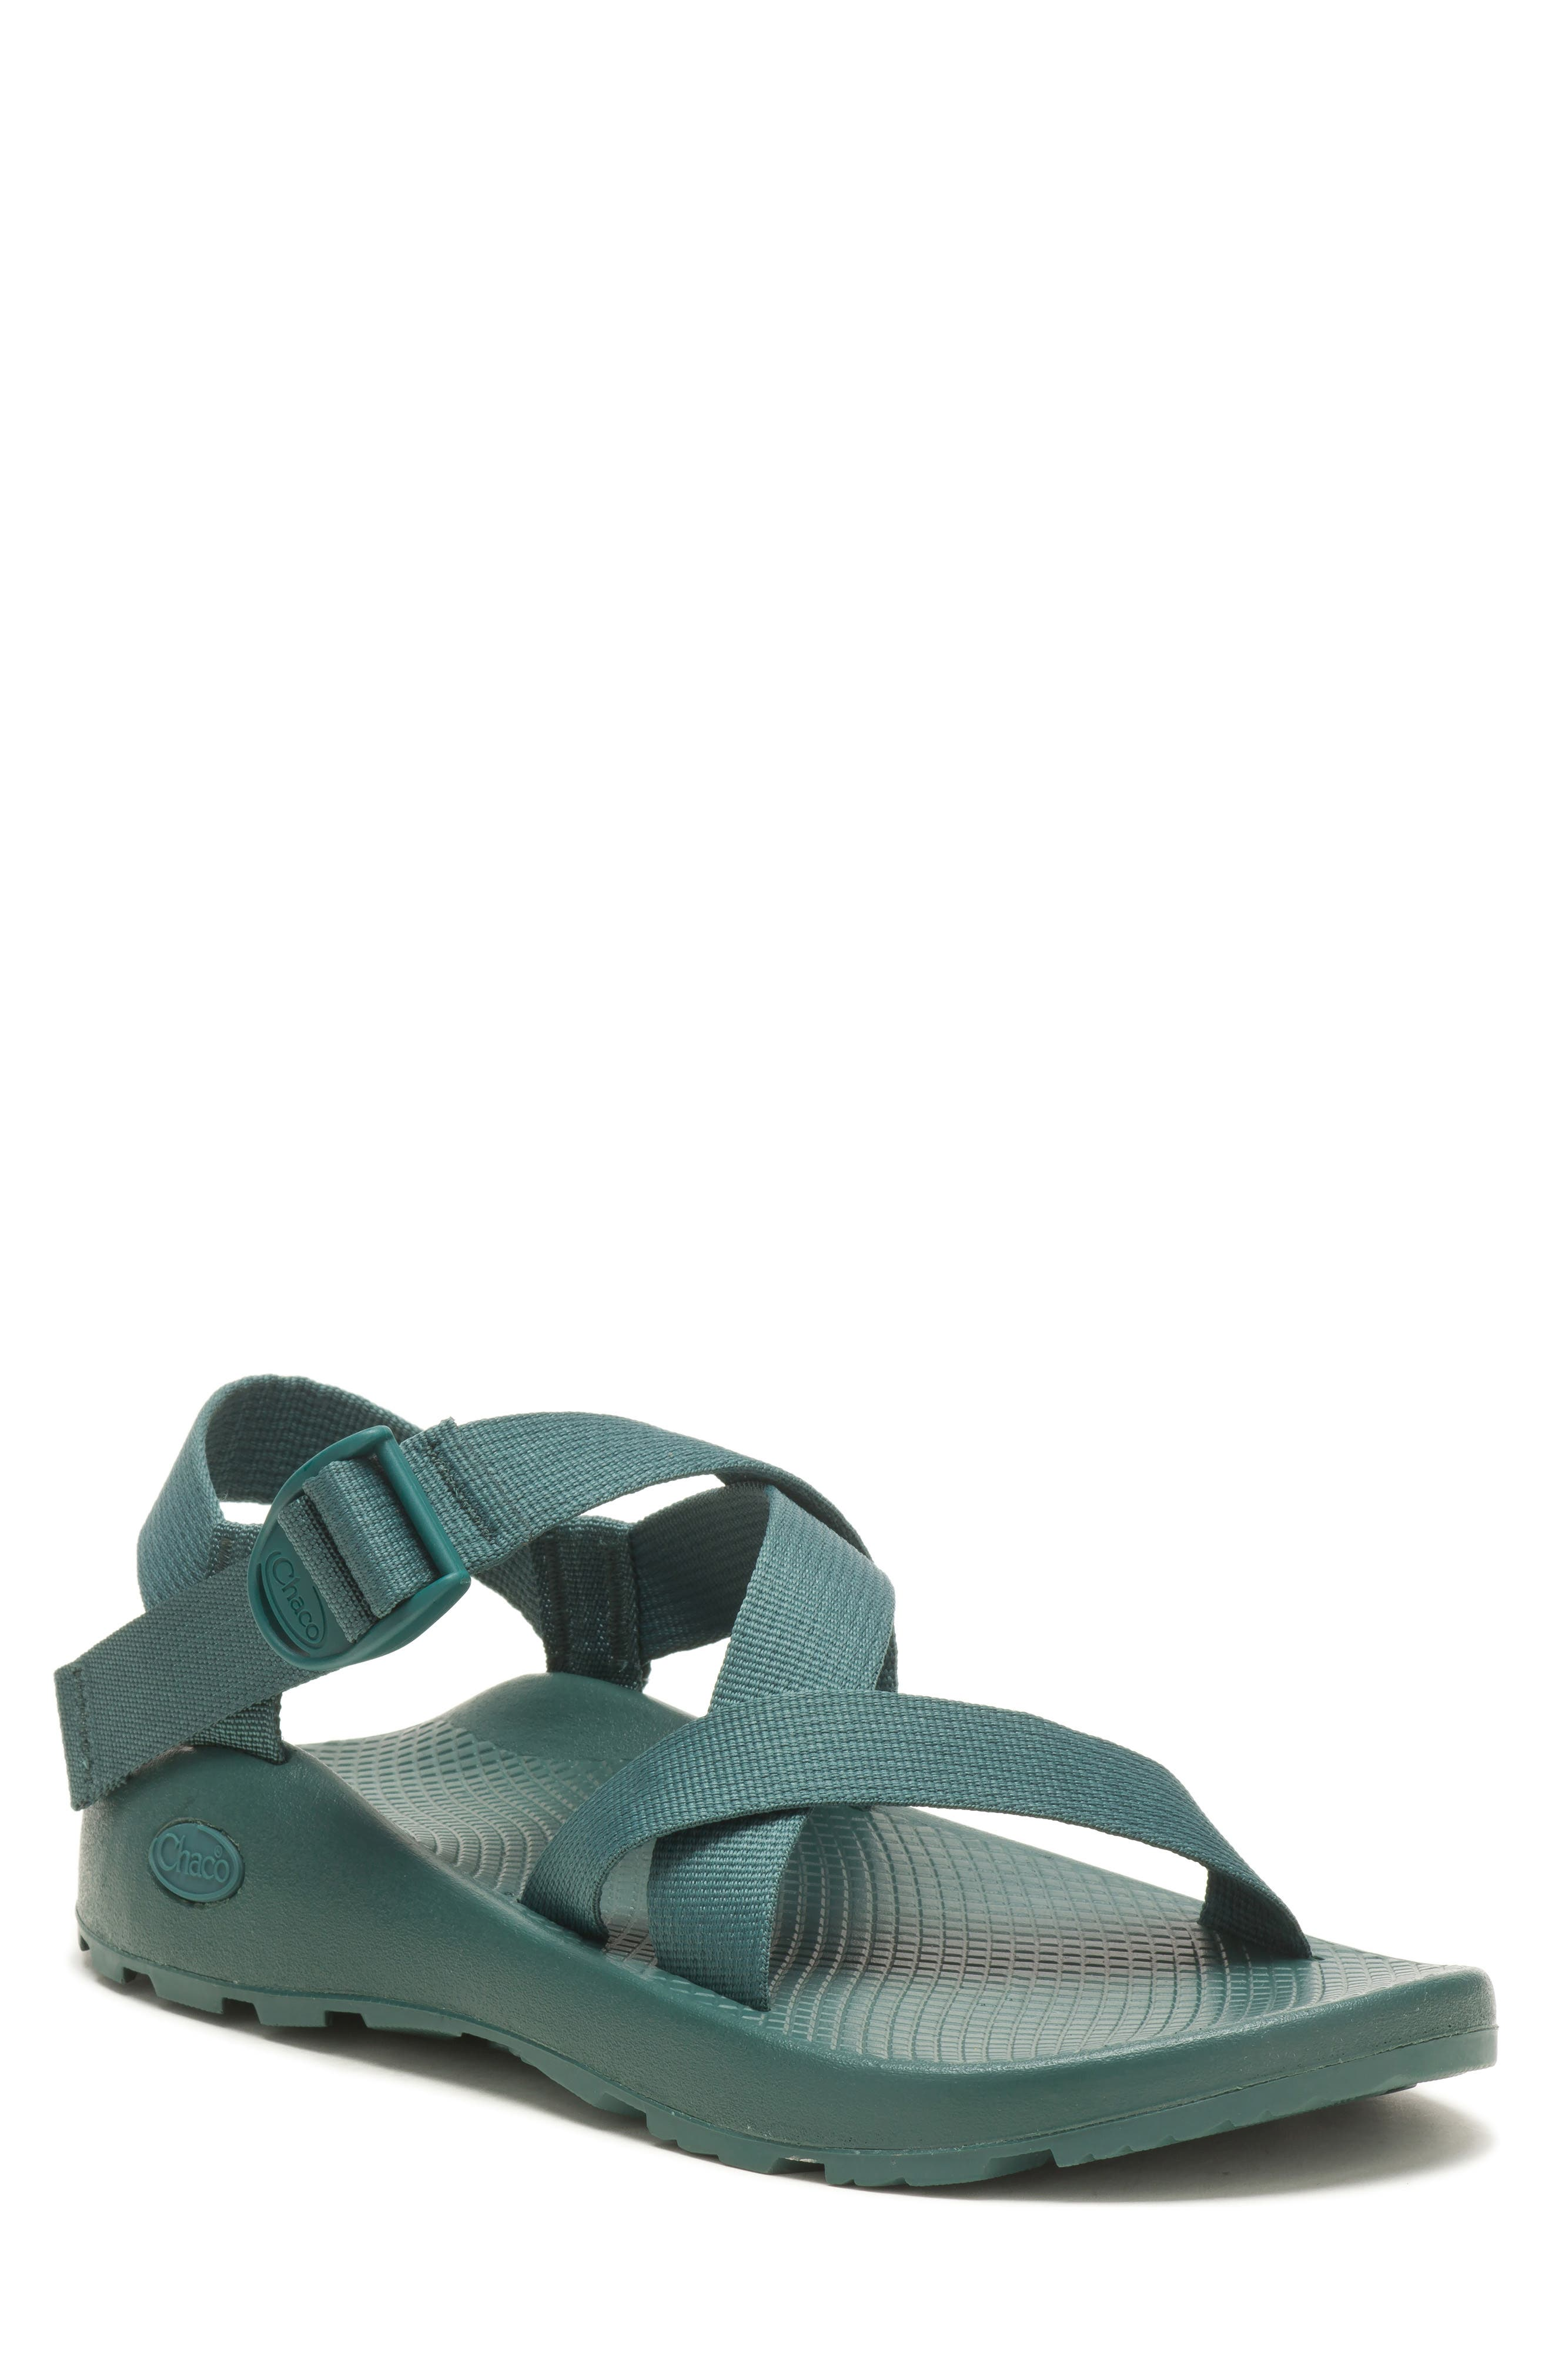 Z1 Classic Sandal